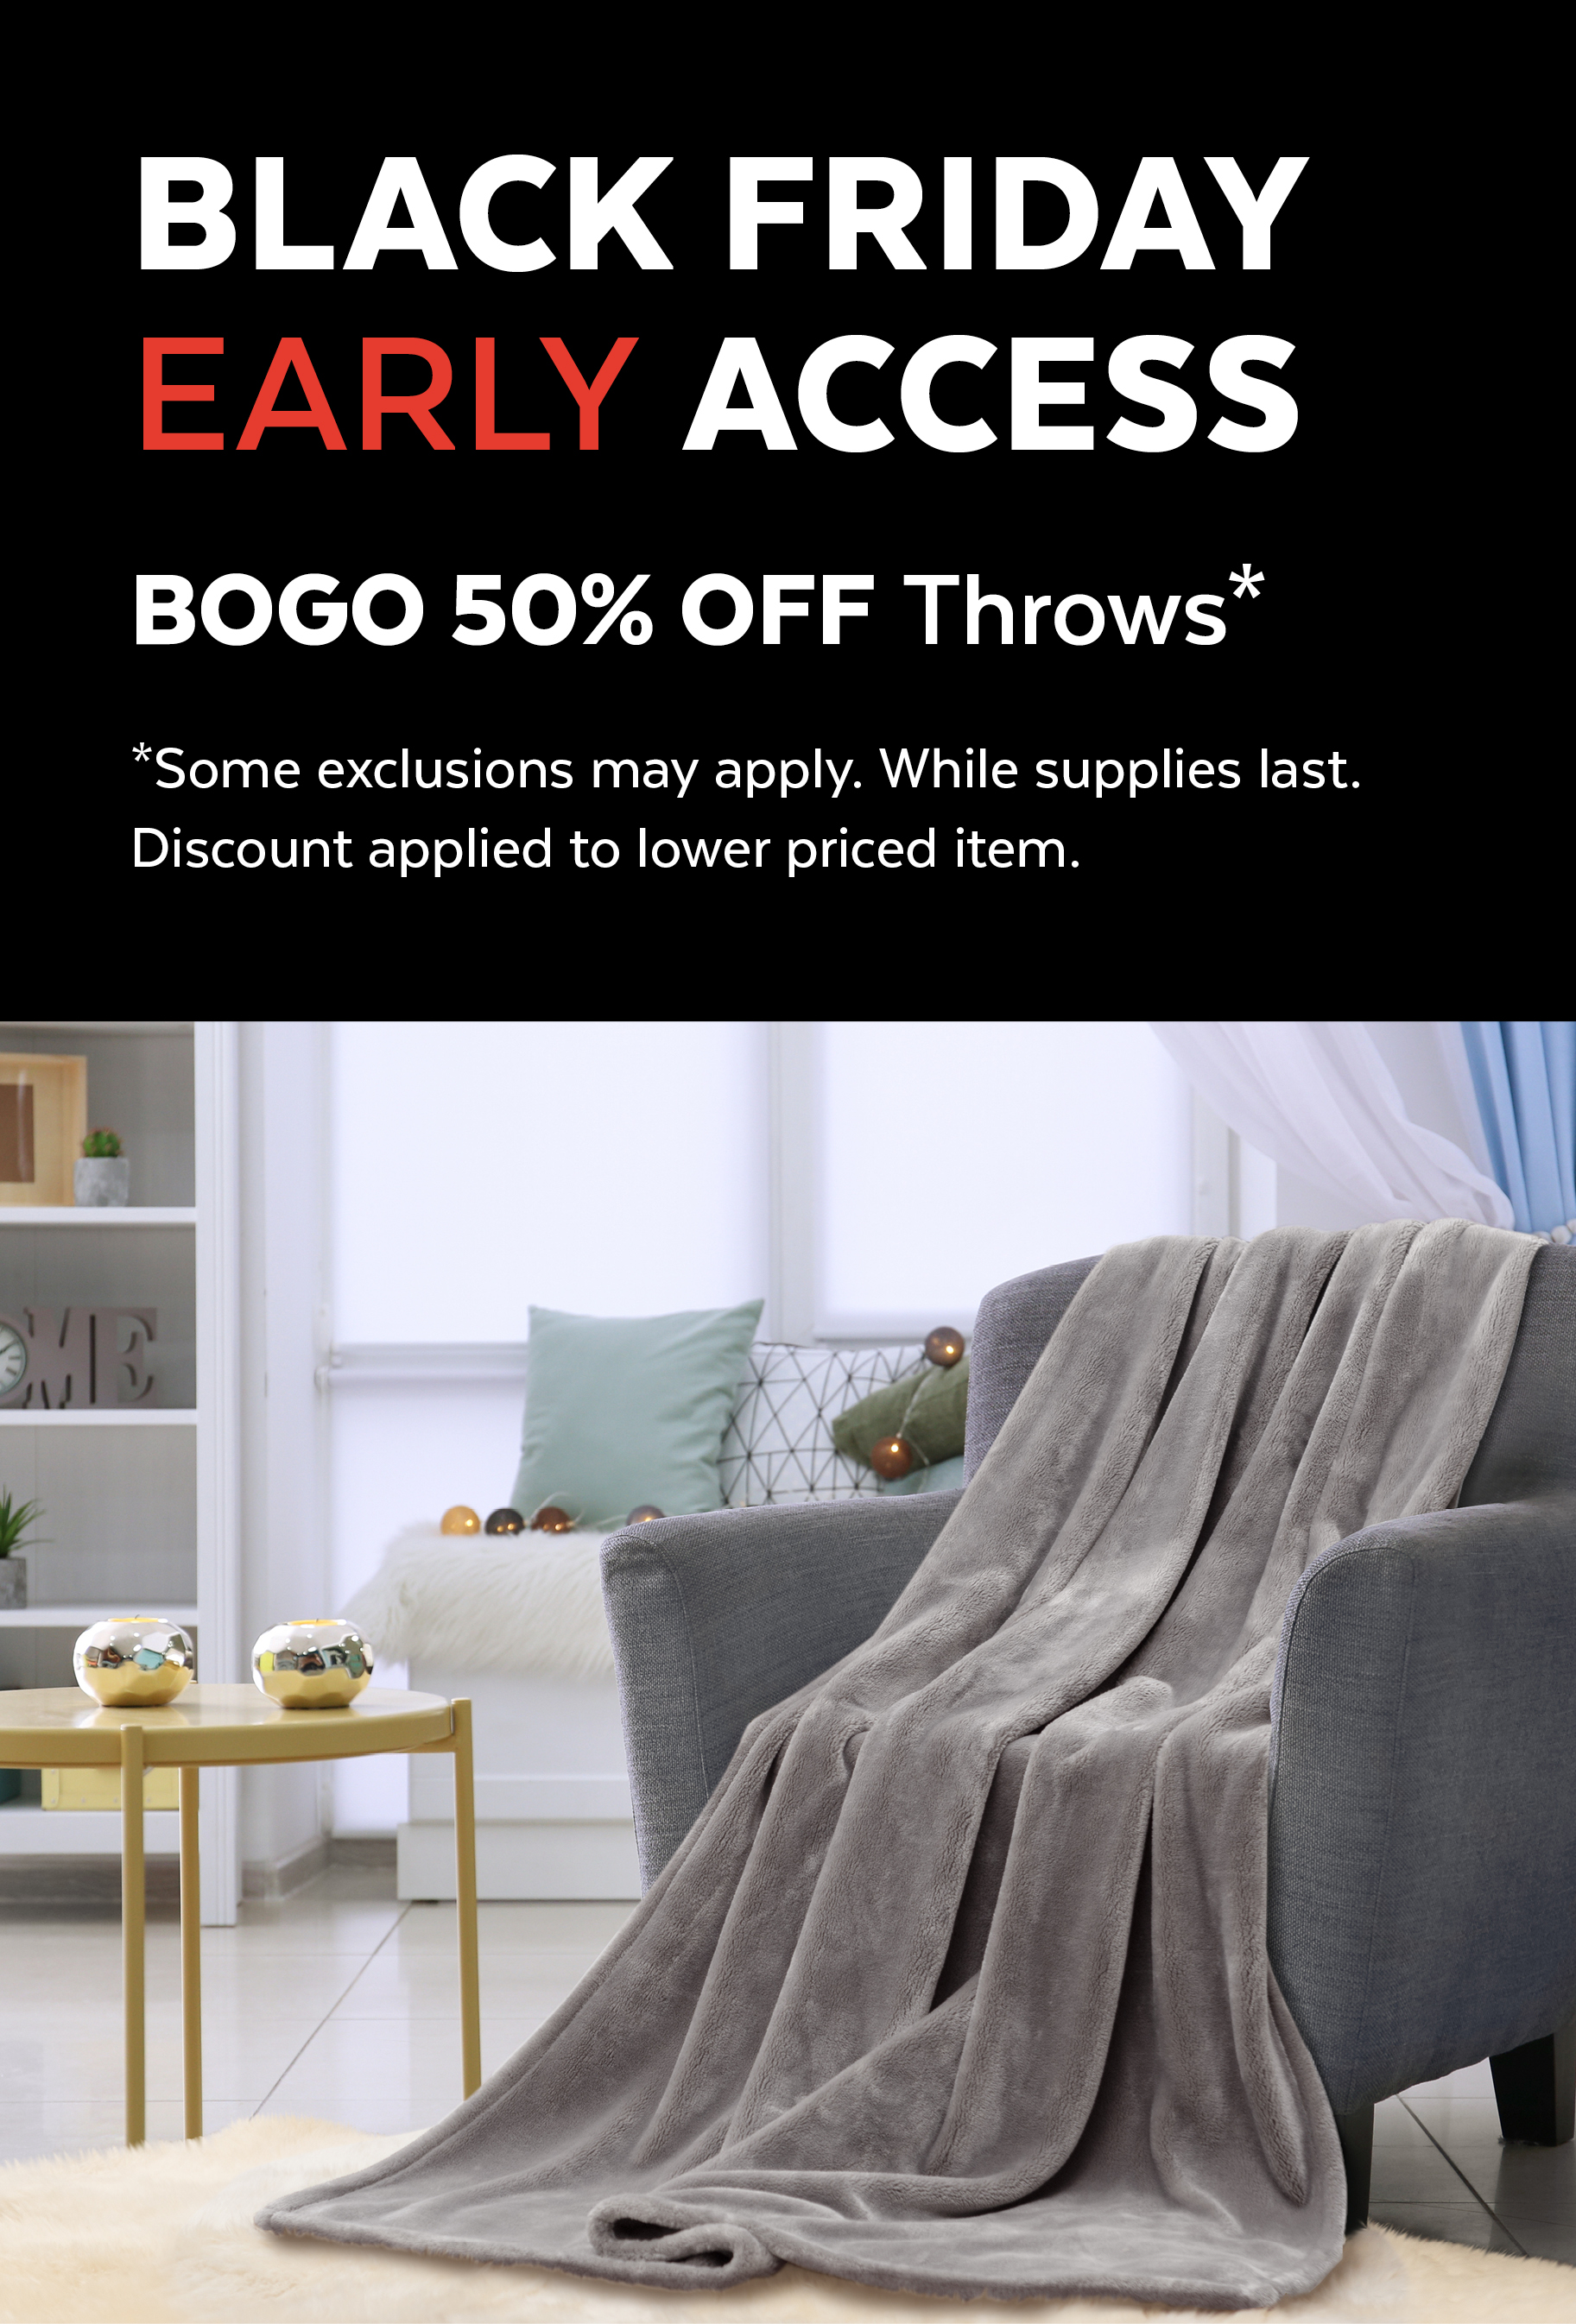 BF BOGO50 Throws